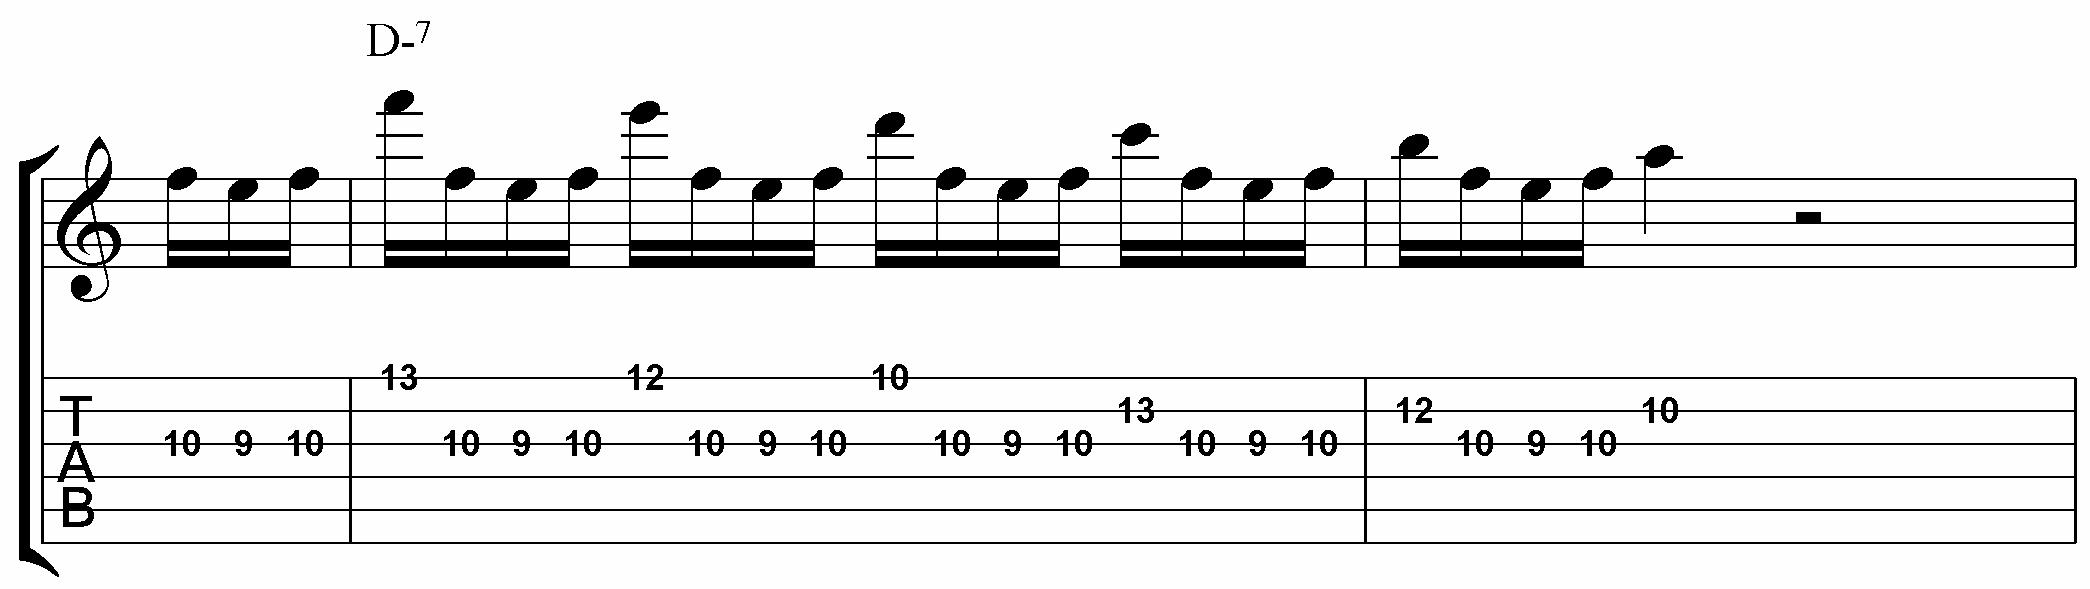 5 Must Know Dorian Licks for Jazz Guitar